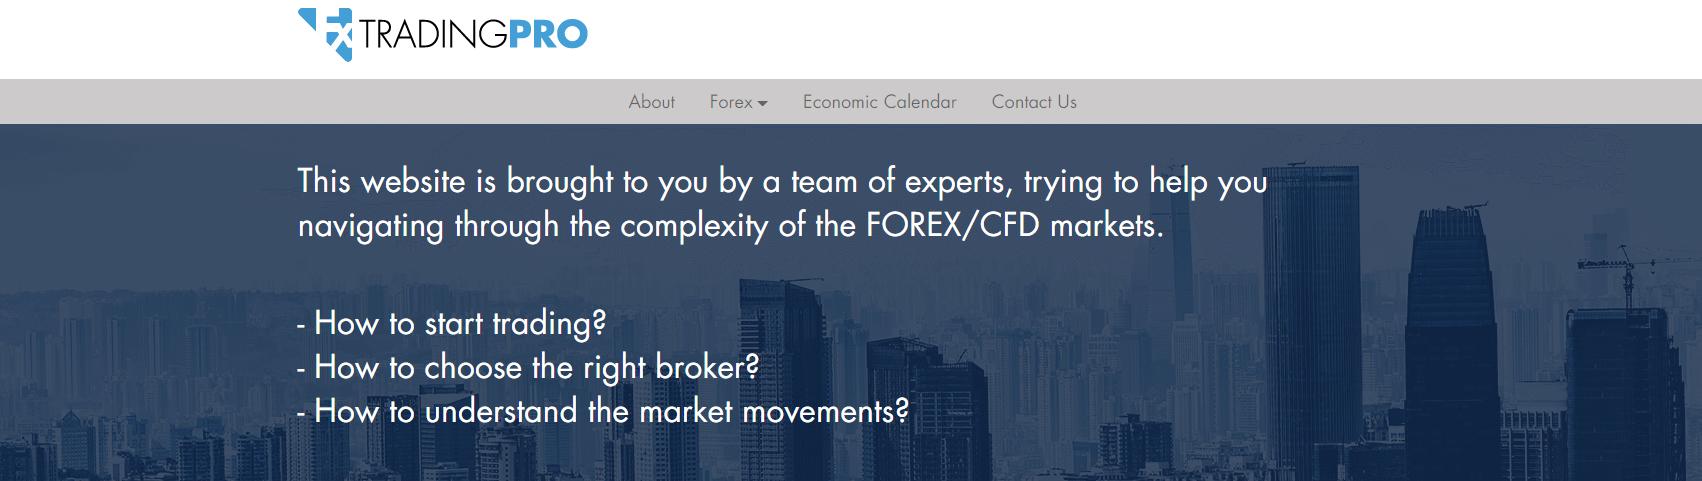 fx trading pro официальный сайт